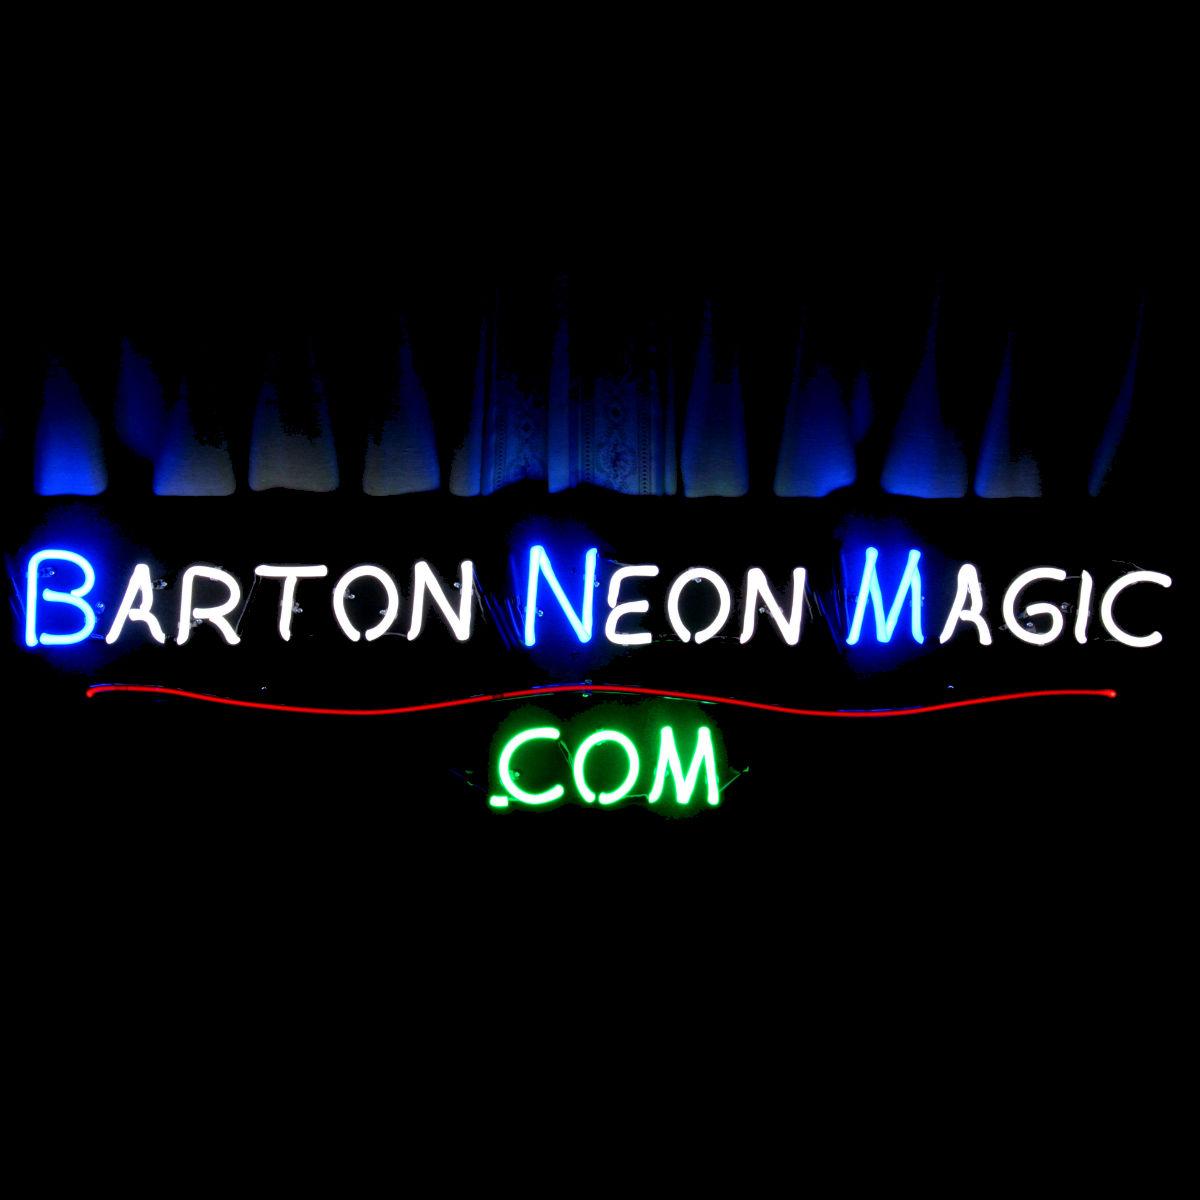 Avanti Dealership Showroom Neon Signs by John Barton - BartonNeonMagic.com